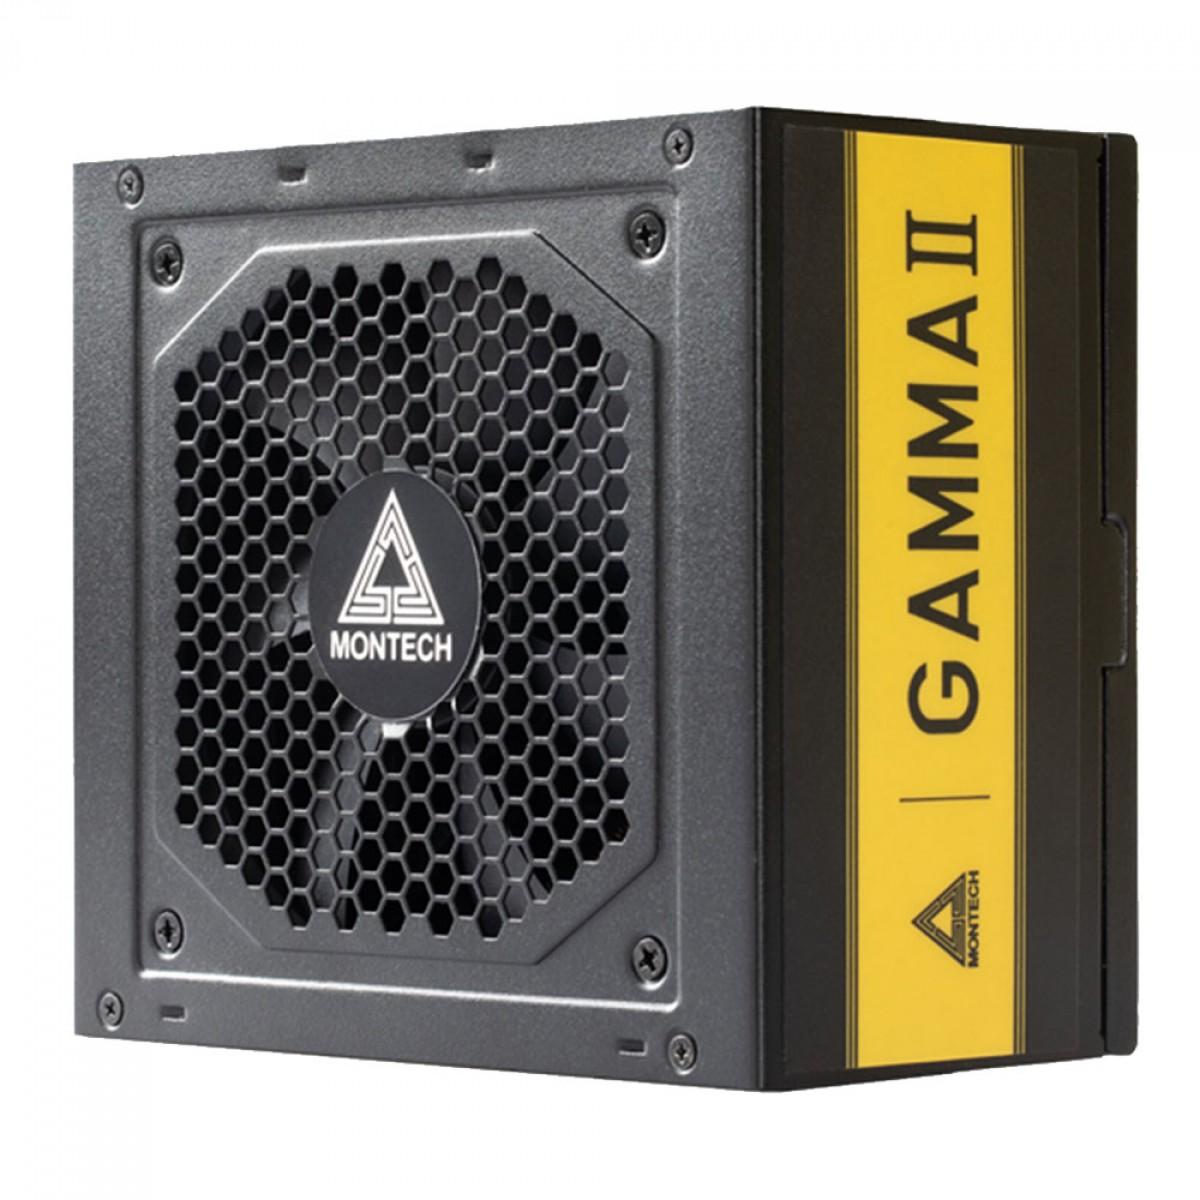 Fonte Montech GAMMA II Gold 650W, 80 Plus Gold, PFC Ativo